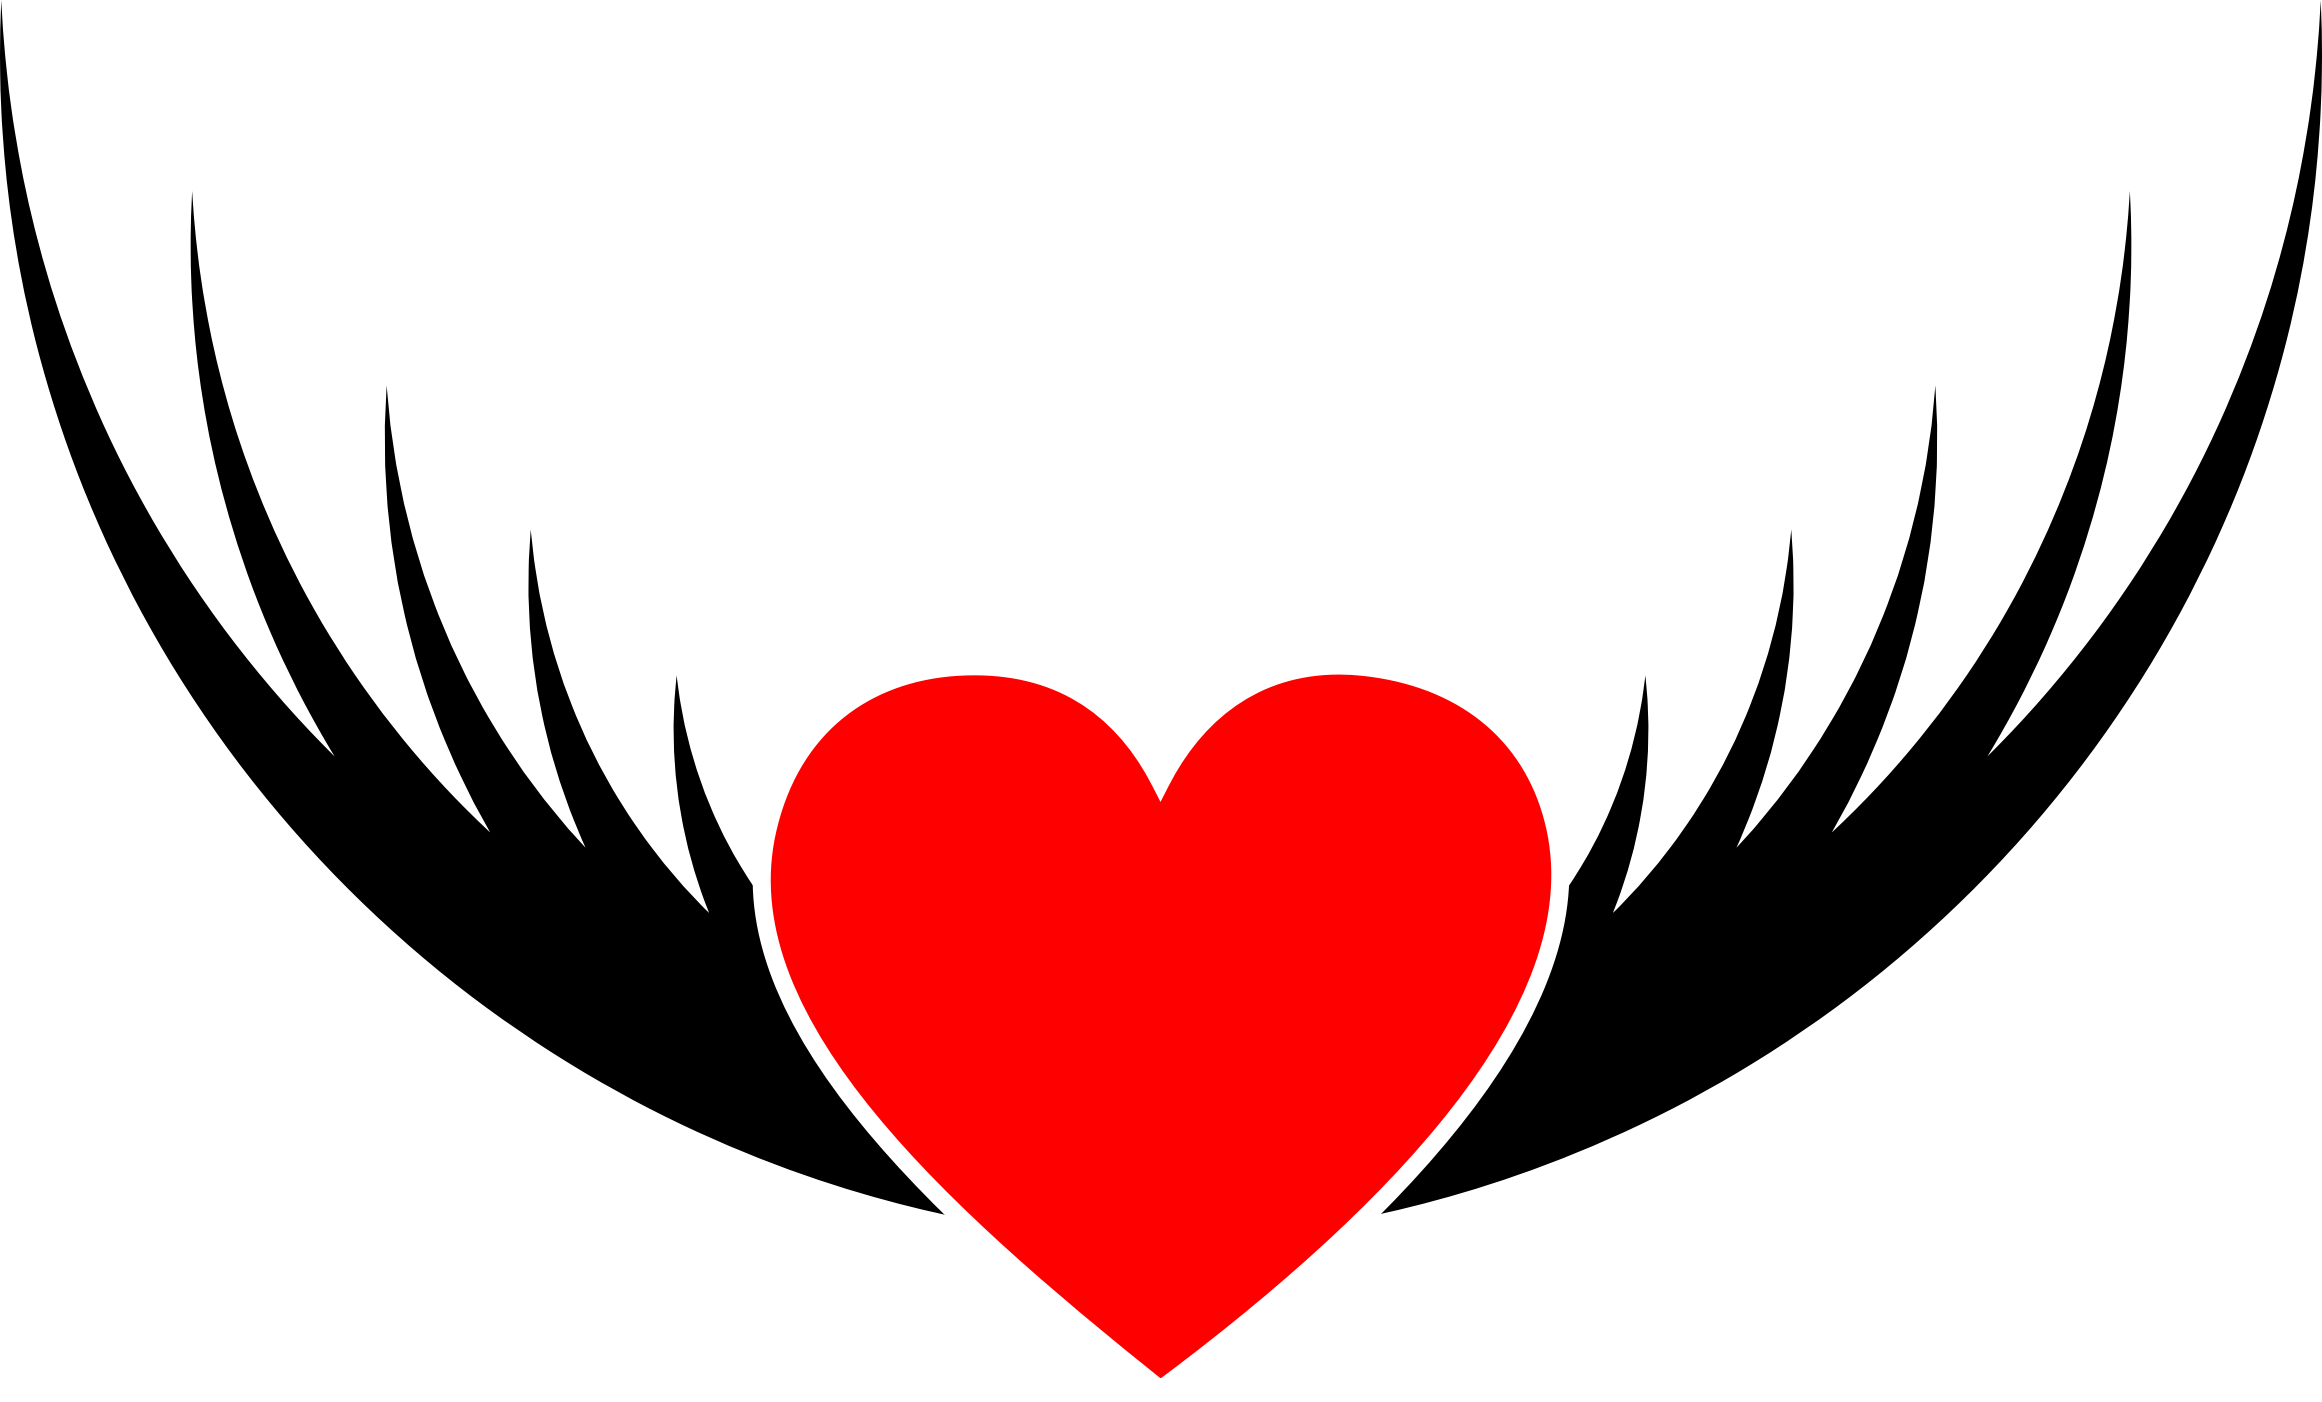 Flying Heart Clipart